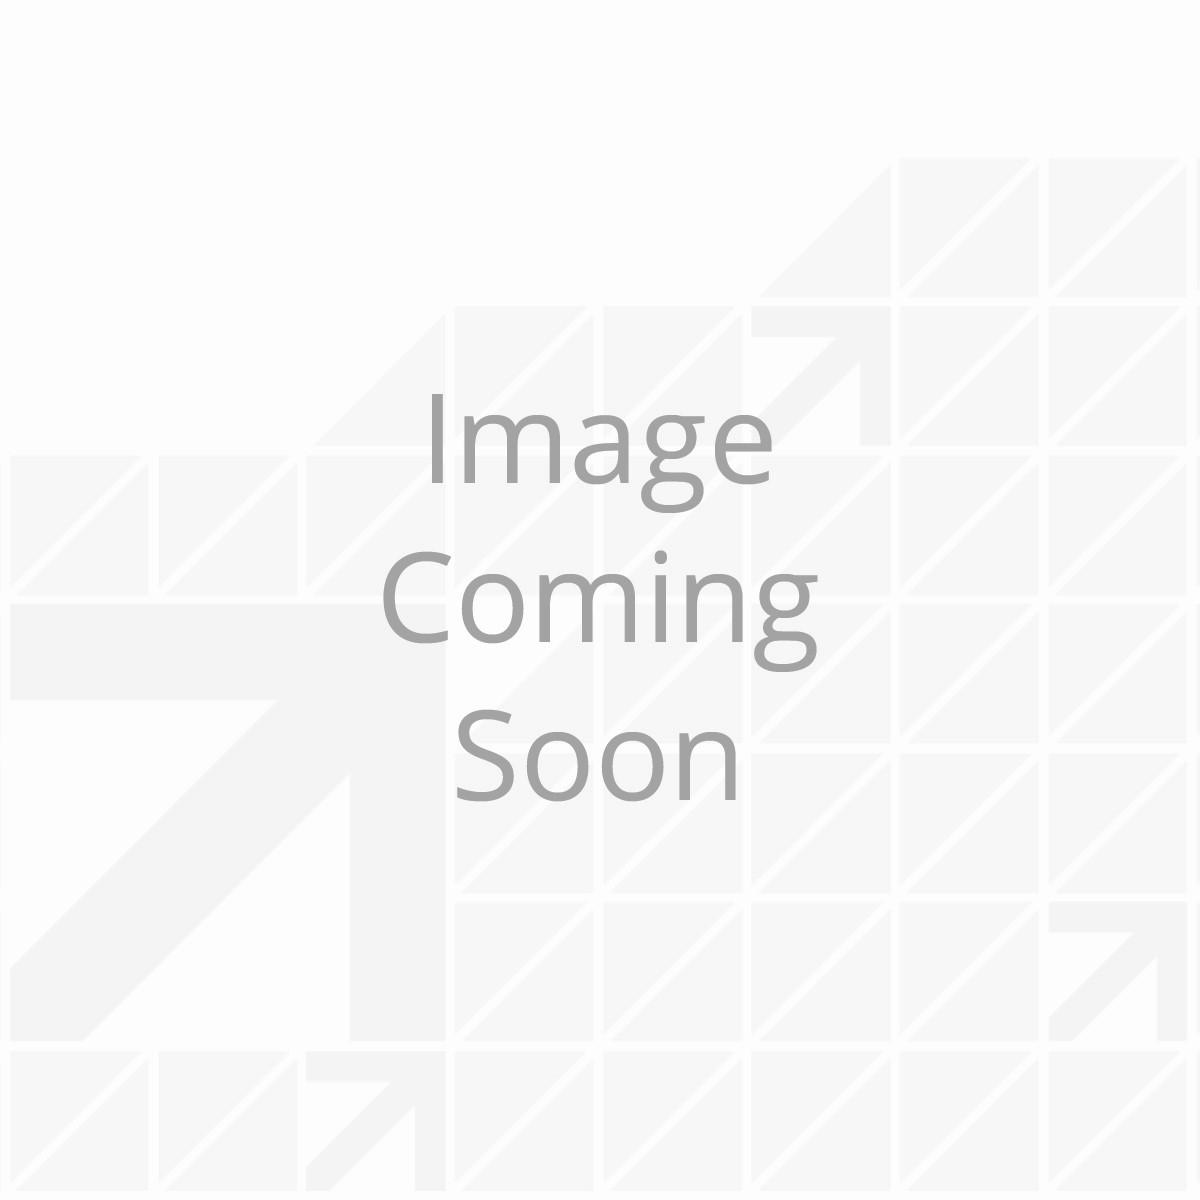 Double Lip Grease Seal - 2200# Trailer Axle Hub